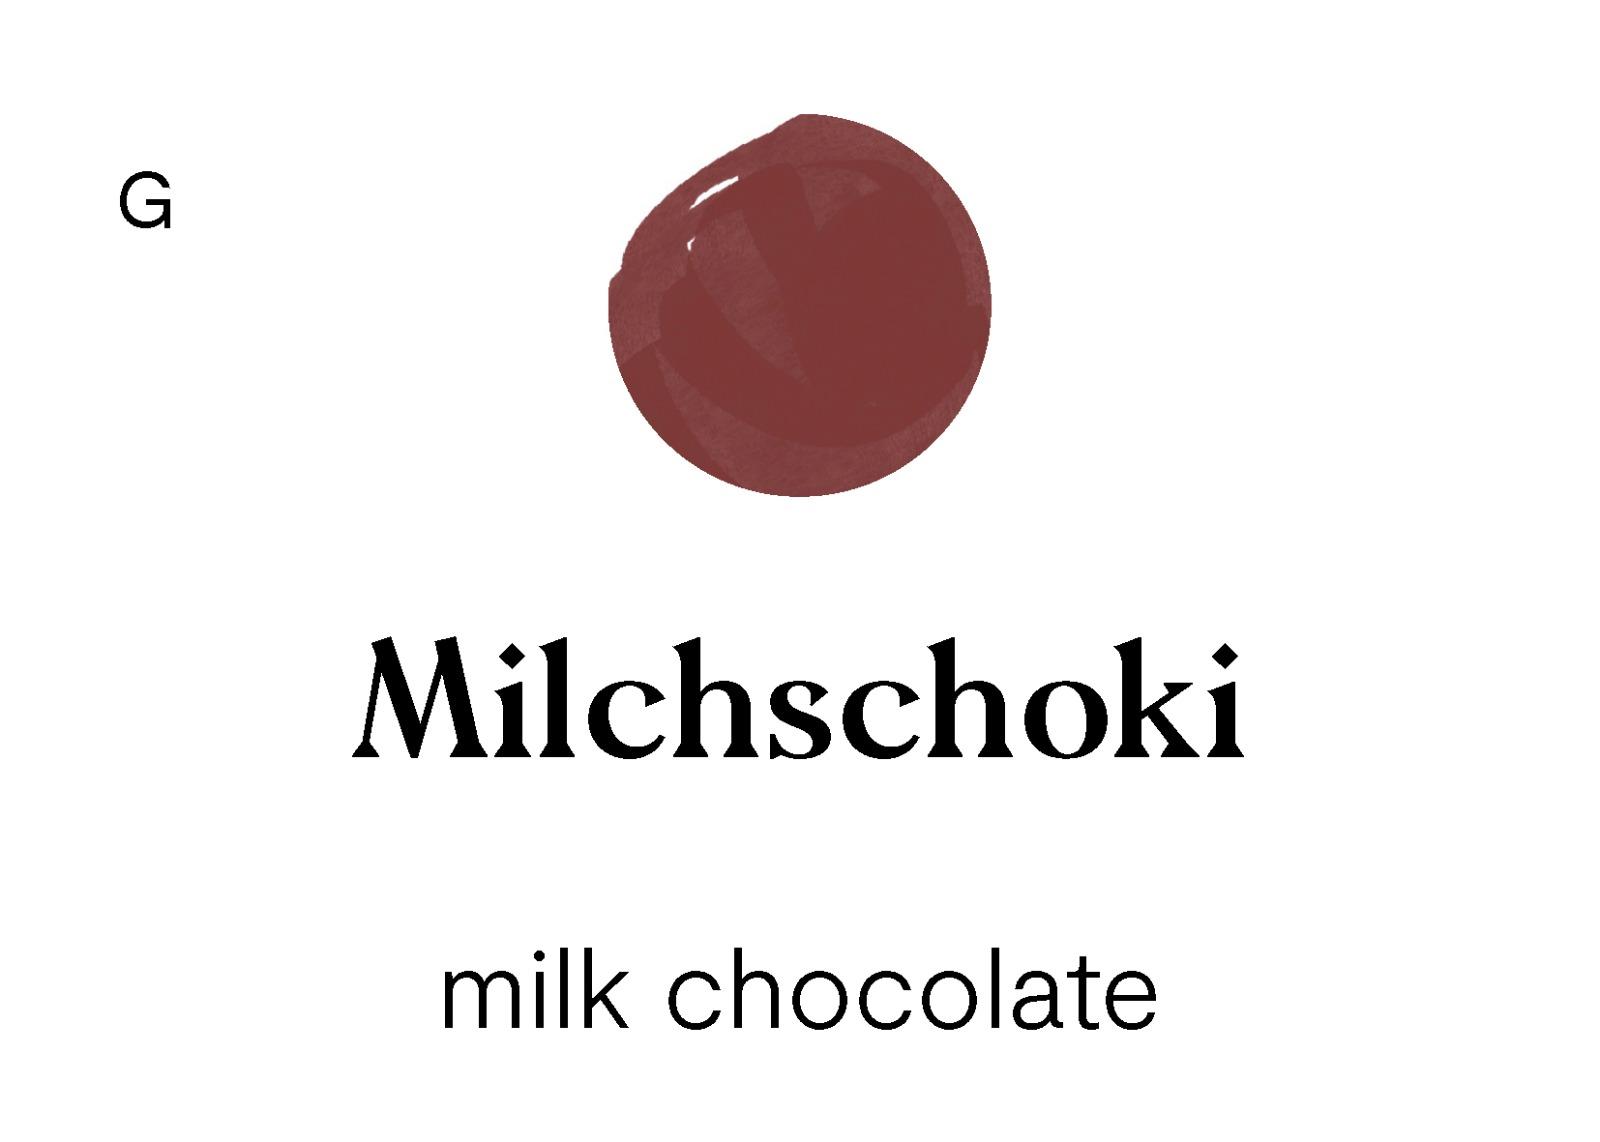 Milchschoki